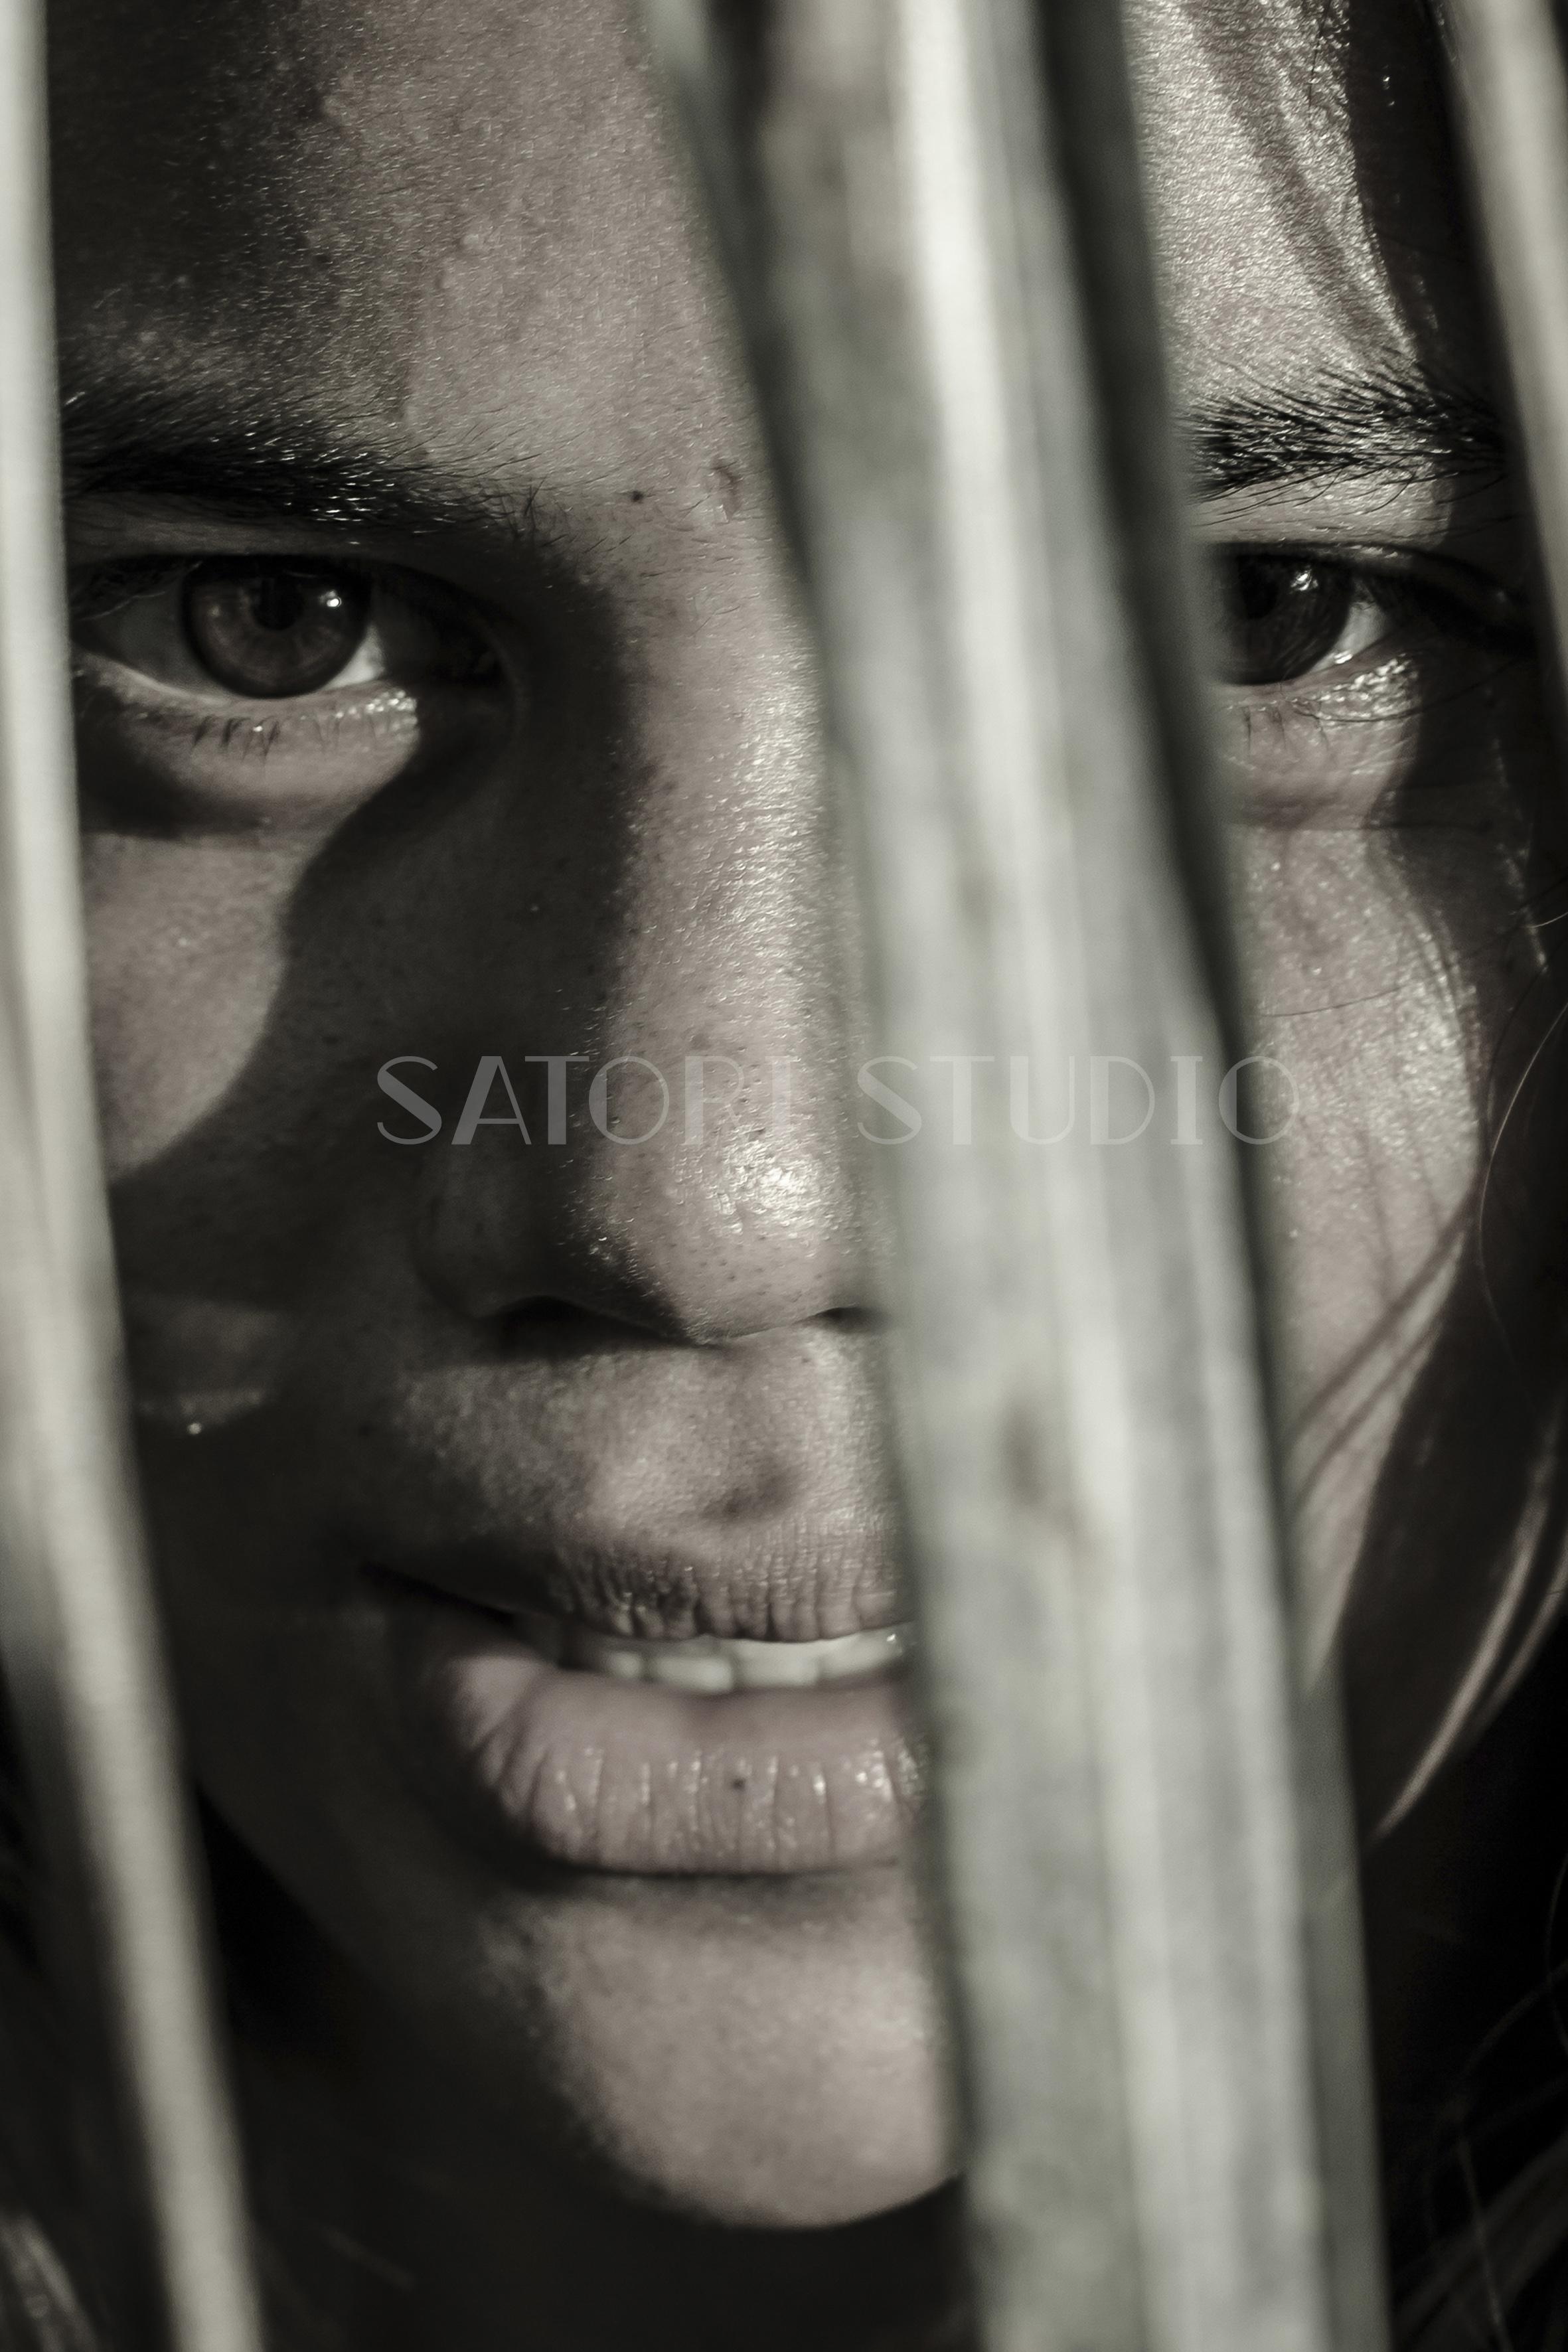 Zenska fotografia -Foto služby